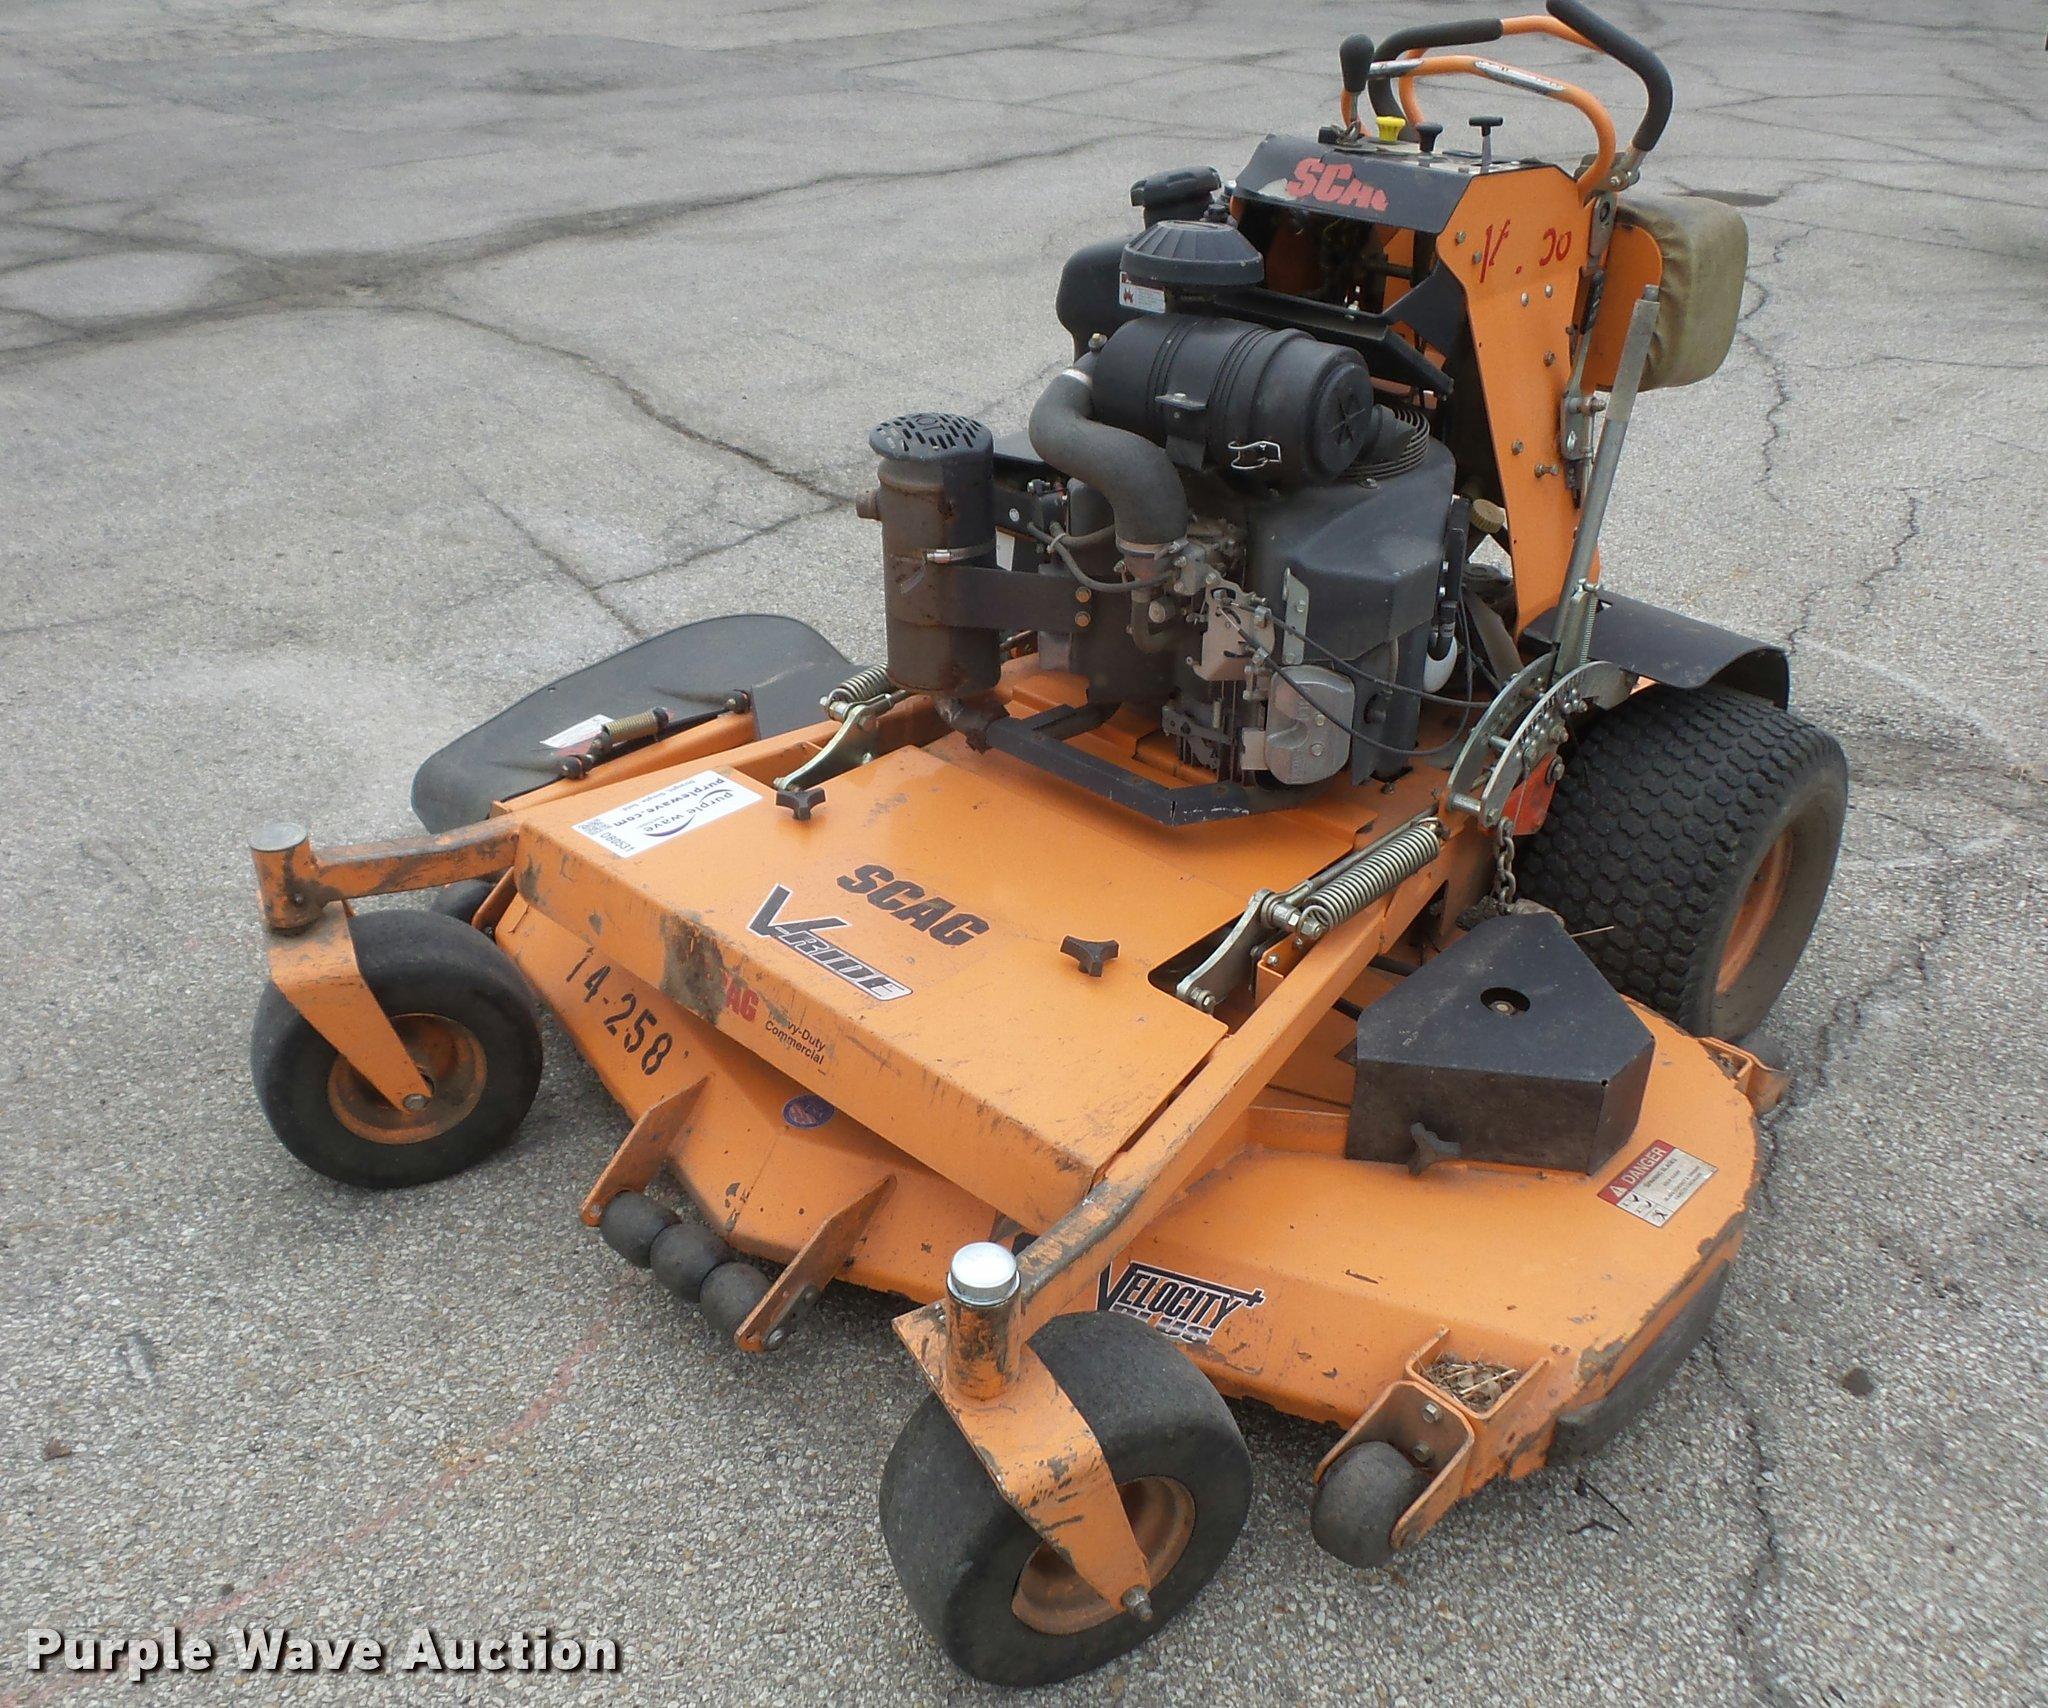 Scag V Ride Lawn Mower Item Db0531 Sold April 4